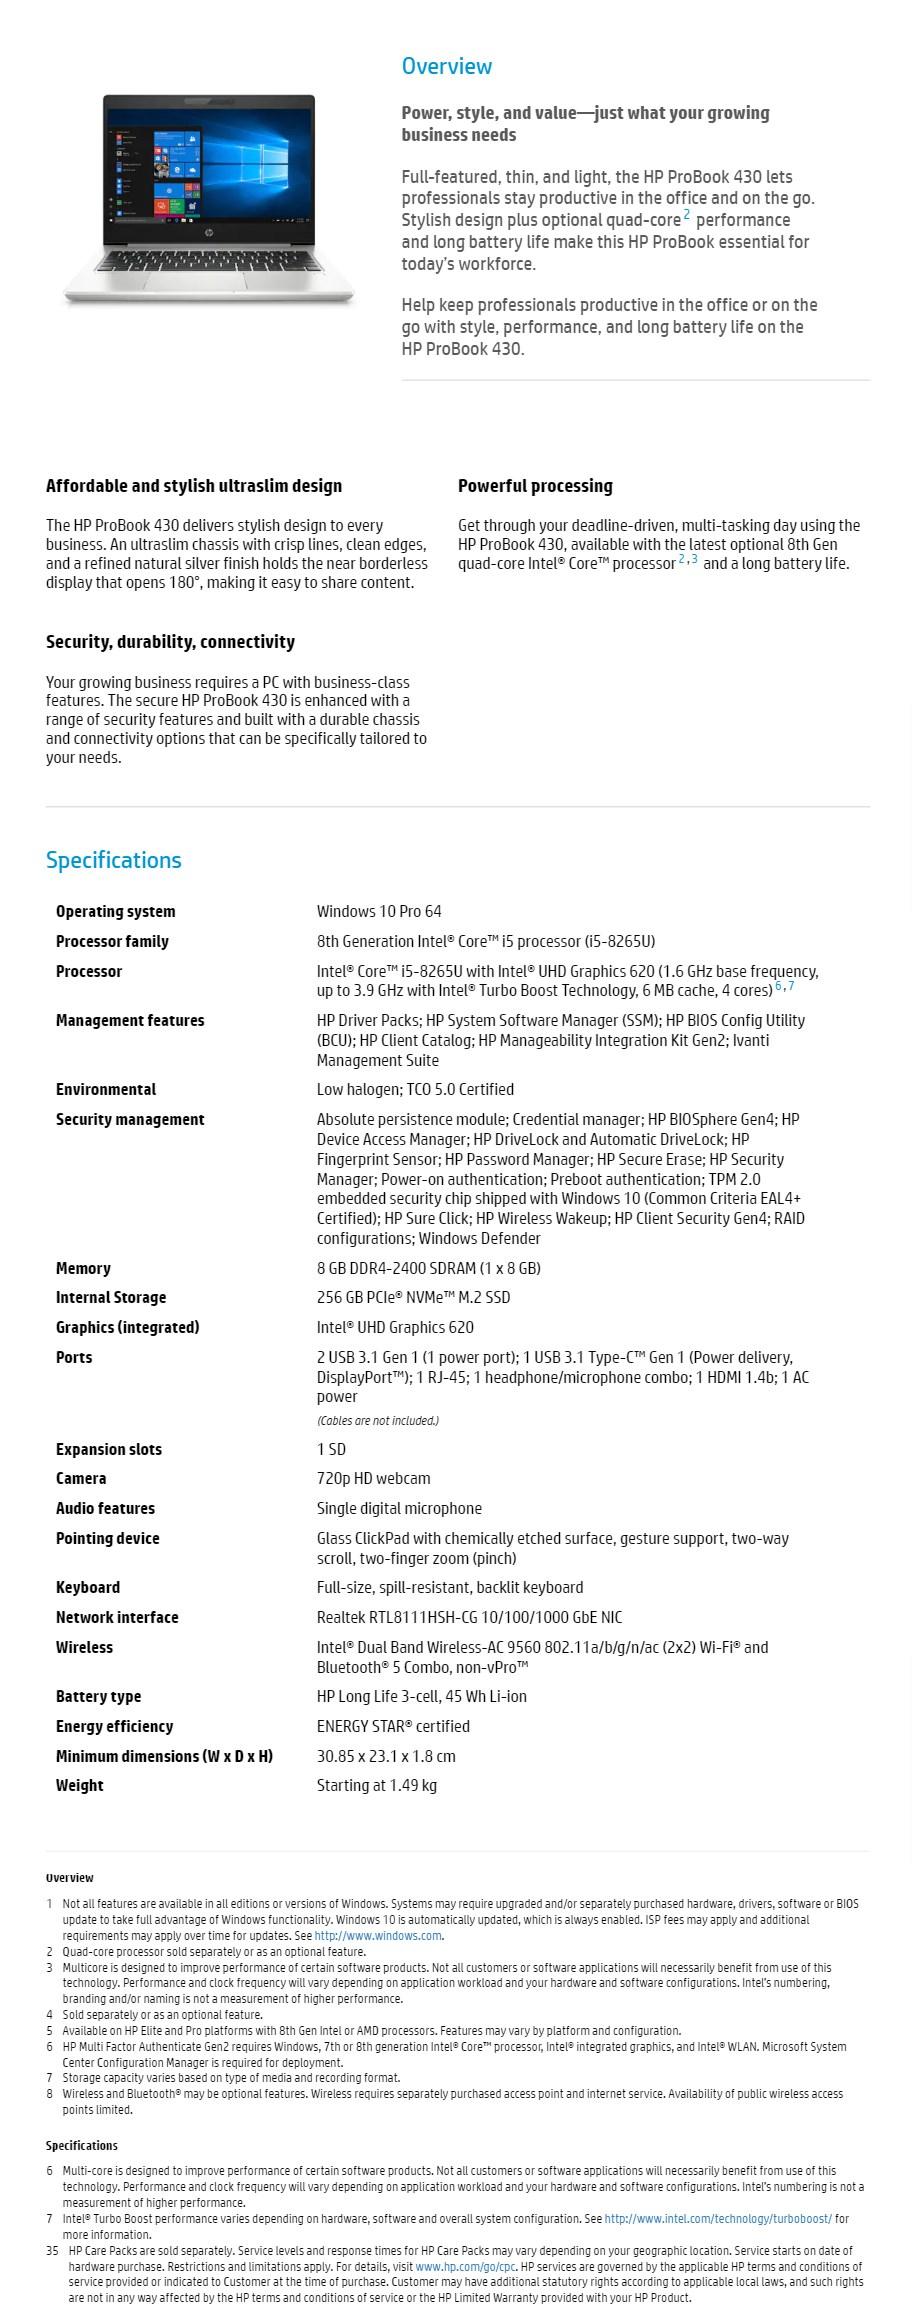 "HP ProBook 430 G6 13.3"" Notebook i5-8265U 8GB 256GB SSD Win10 Pro - Desktop Overview 1"